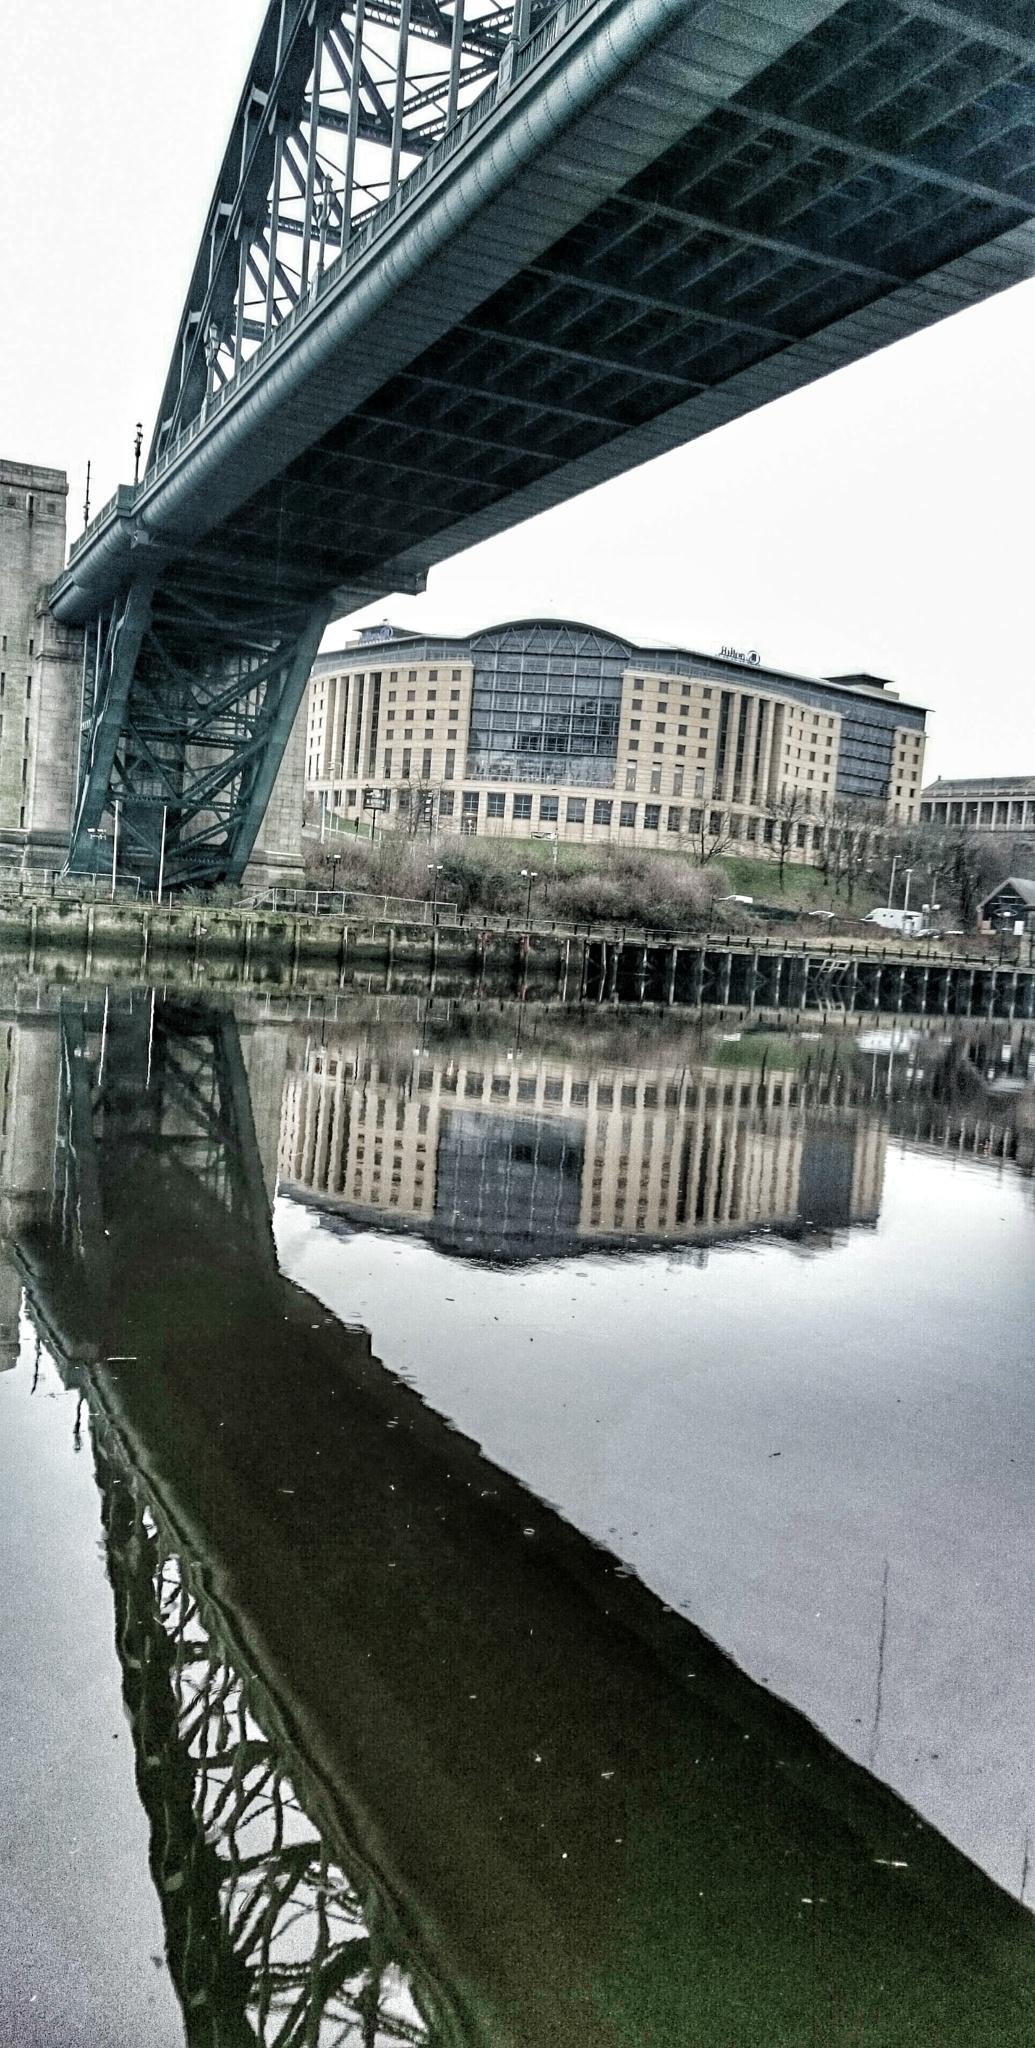 Tyne Bridge reflection  by Darren Turner